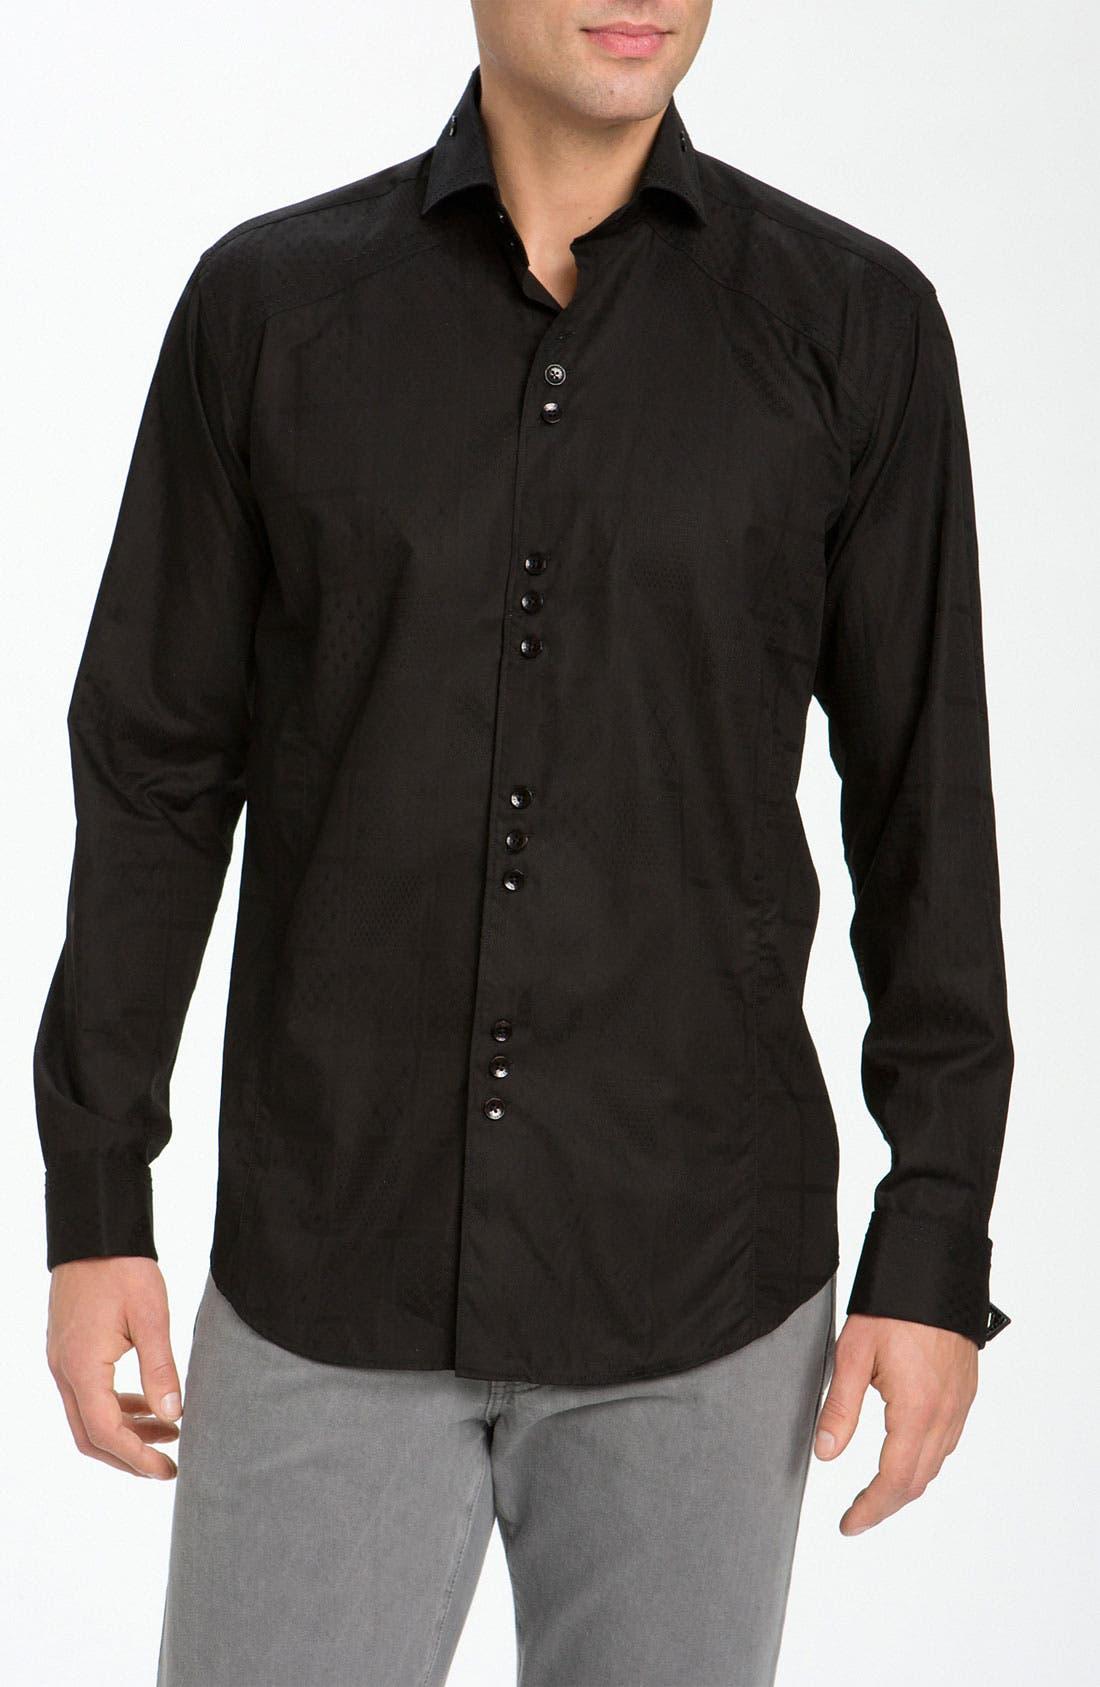 Alternate Image 1 Selected - Bogosse 'Matis' Jacquard Sport Shirt